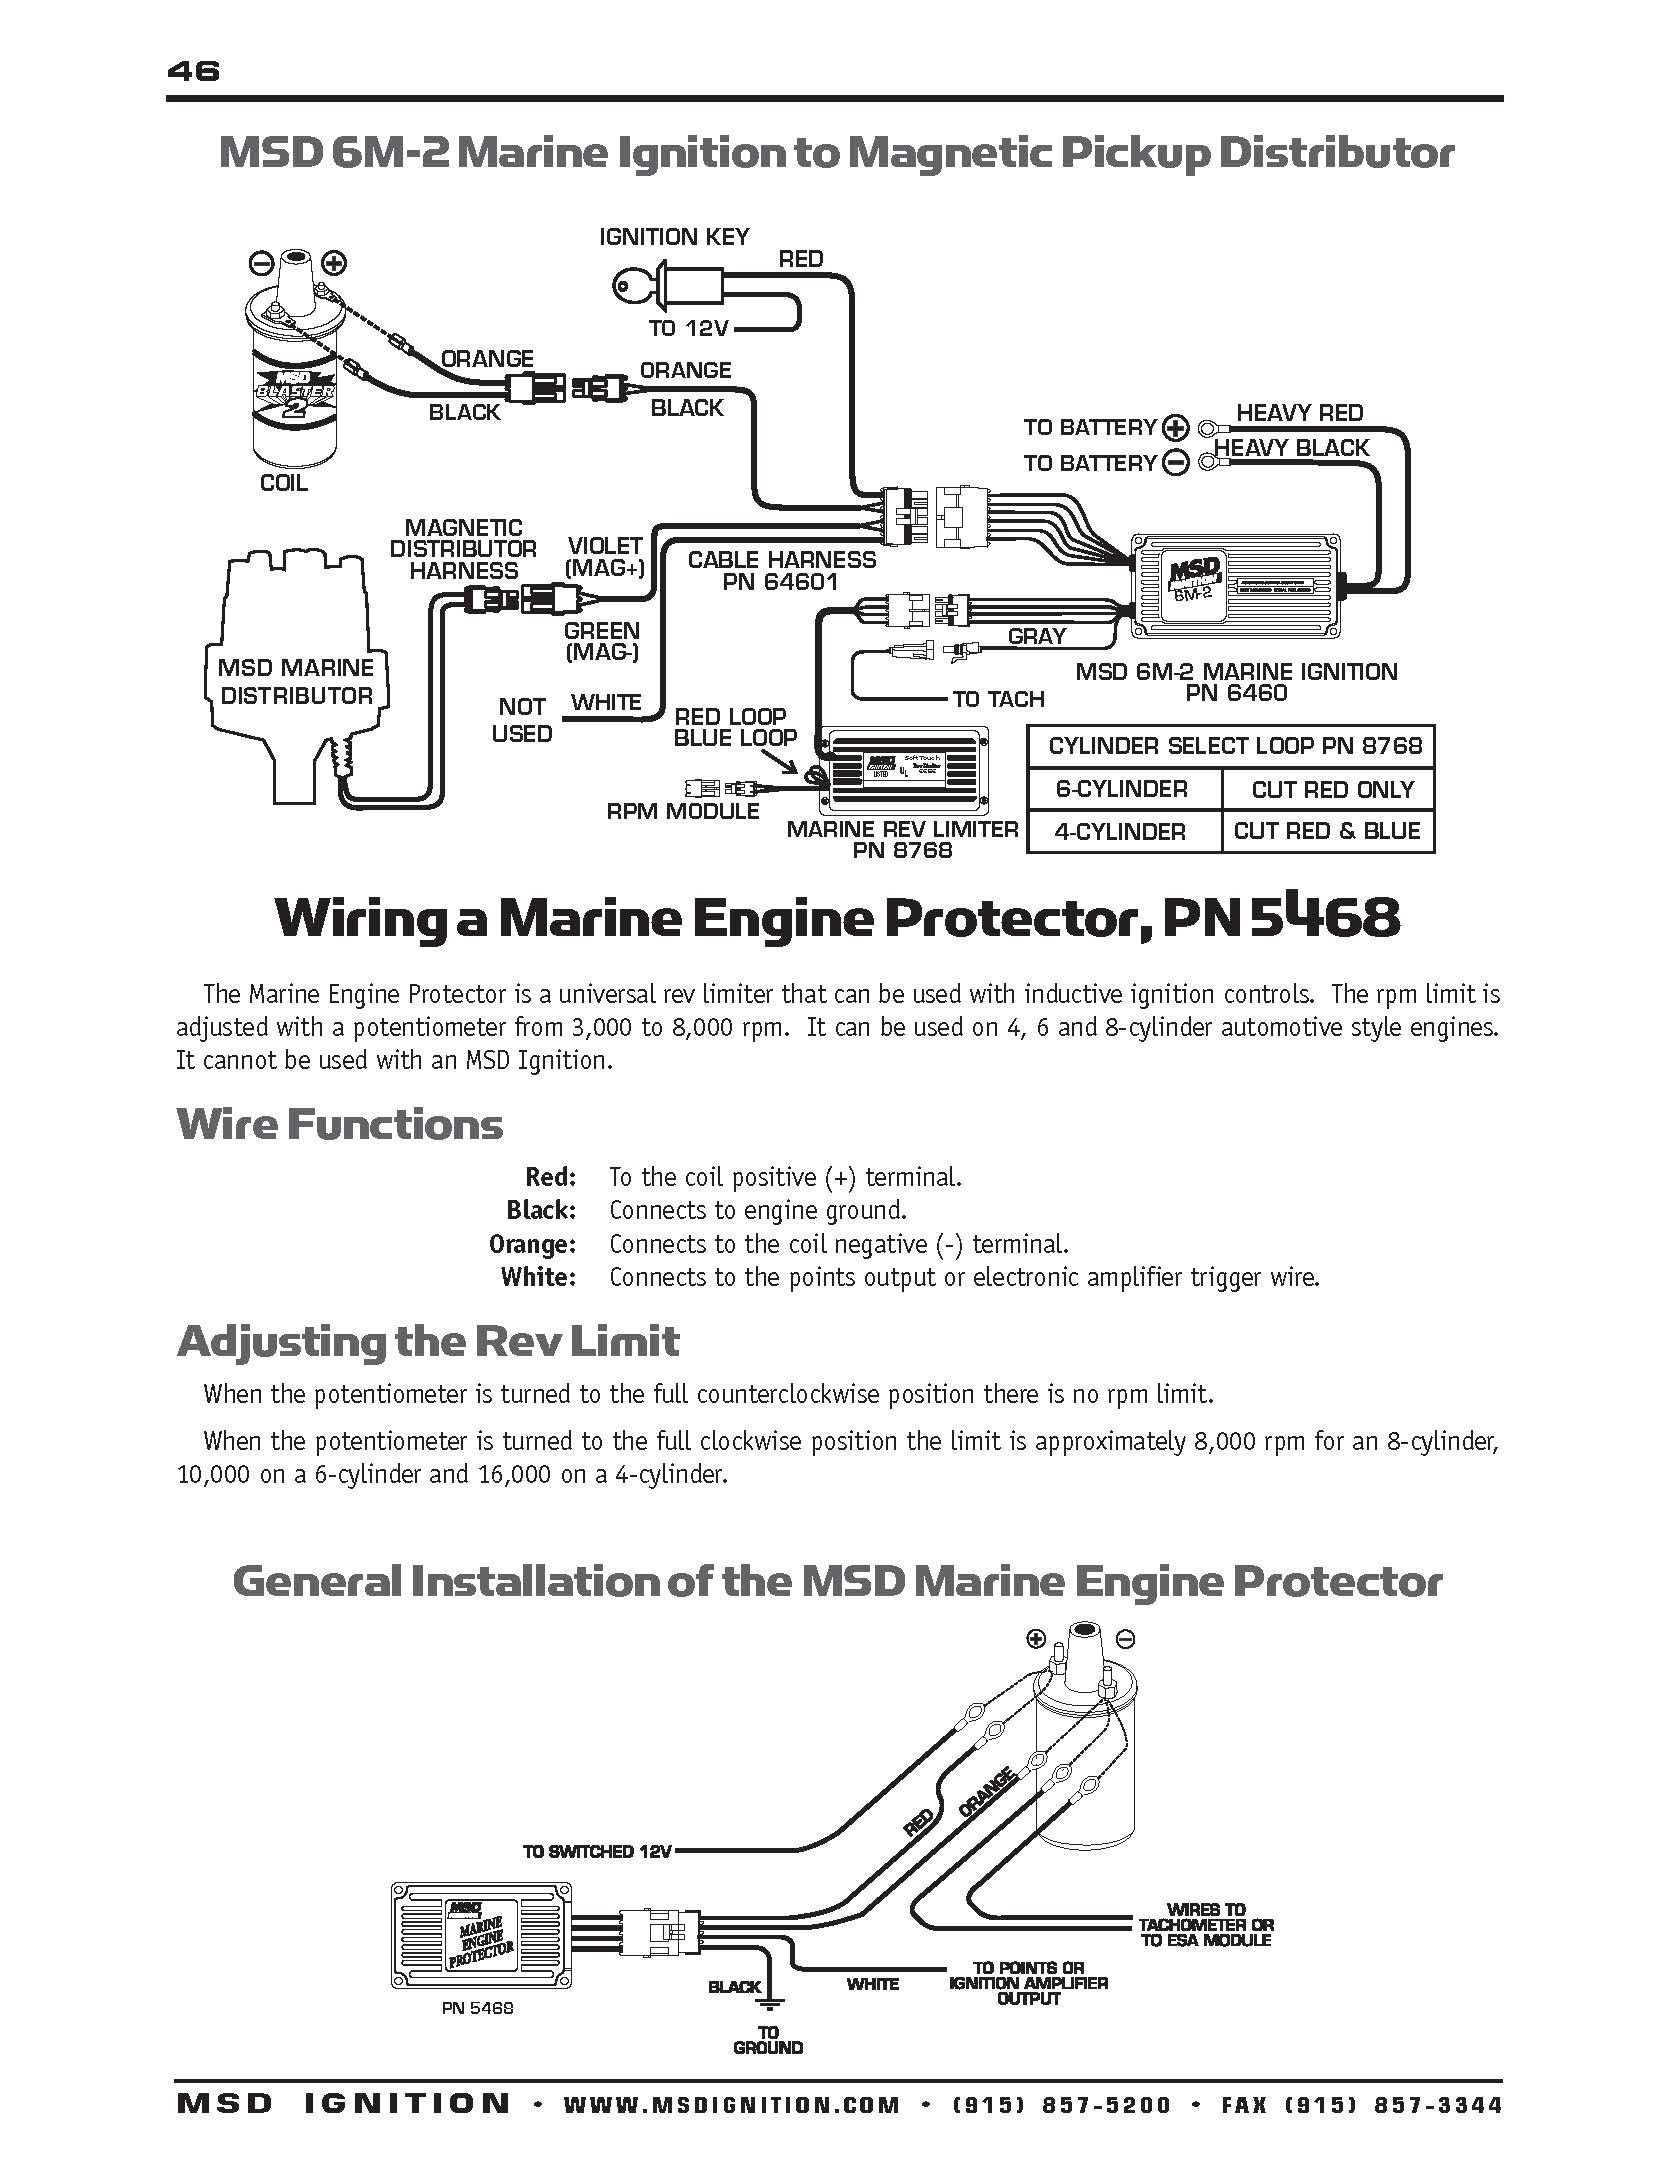 msd rpm switch wiring diagram yd 7025  msd 3 step wiring diagram in addition msd blaster coil  yd 7025  msd 3 step wiring diagram in